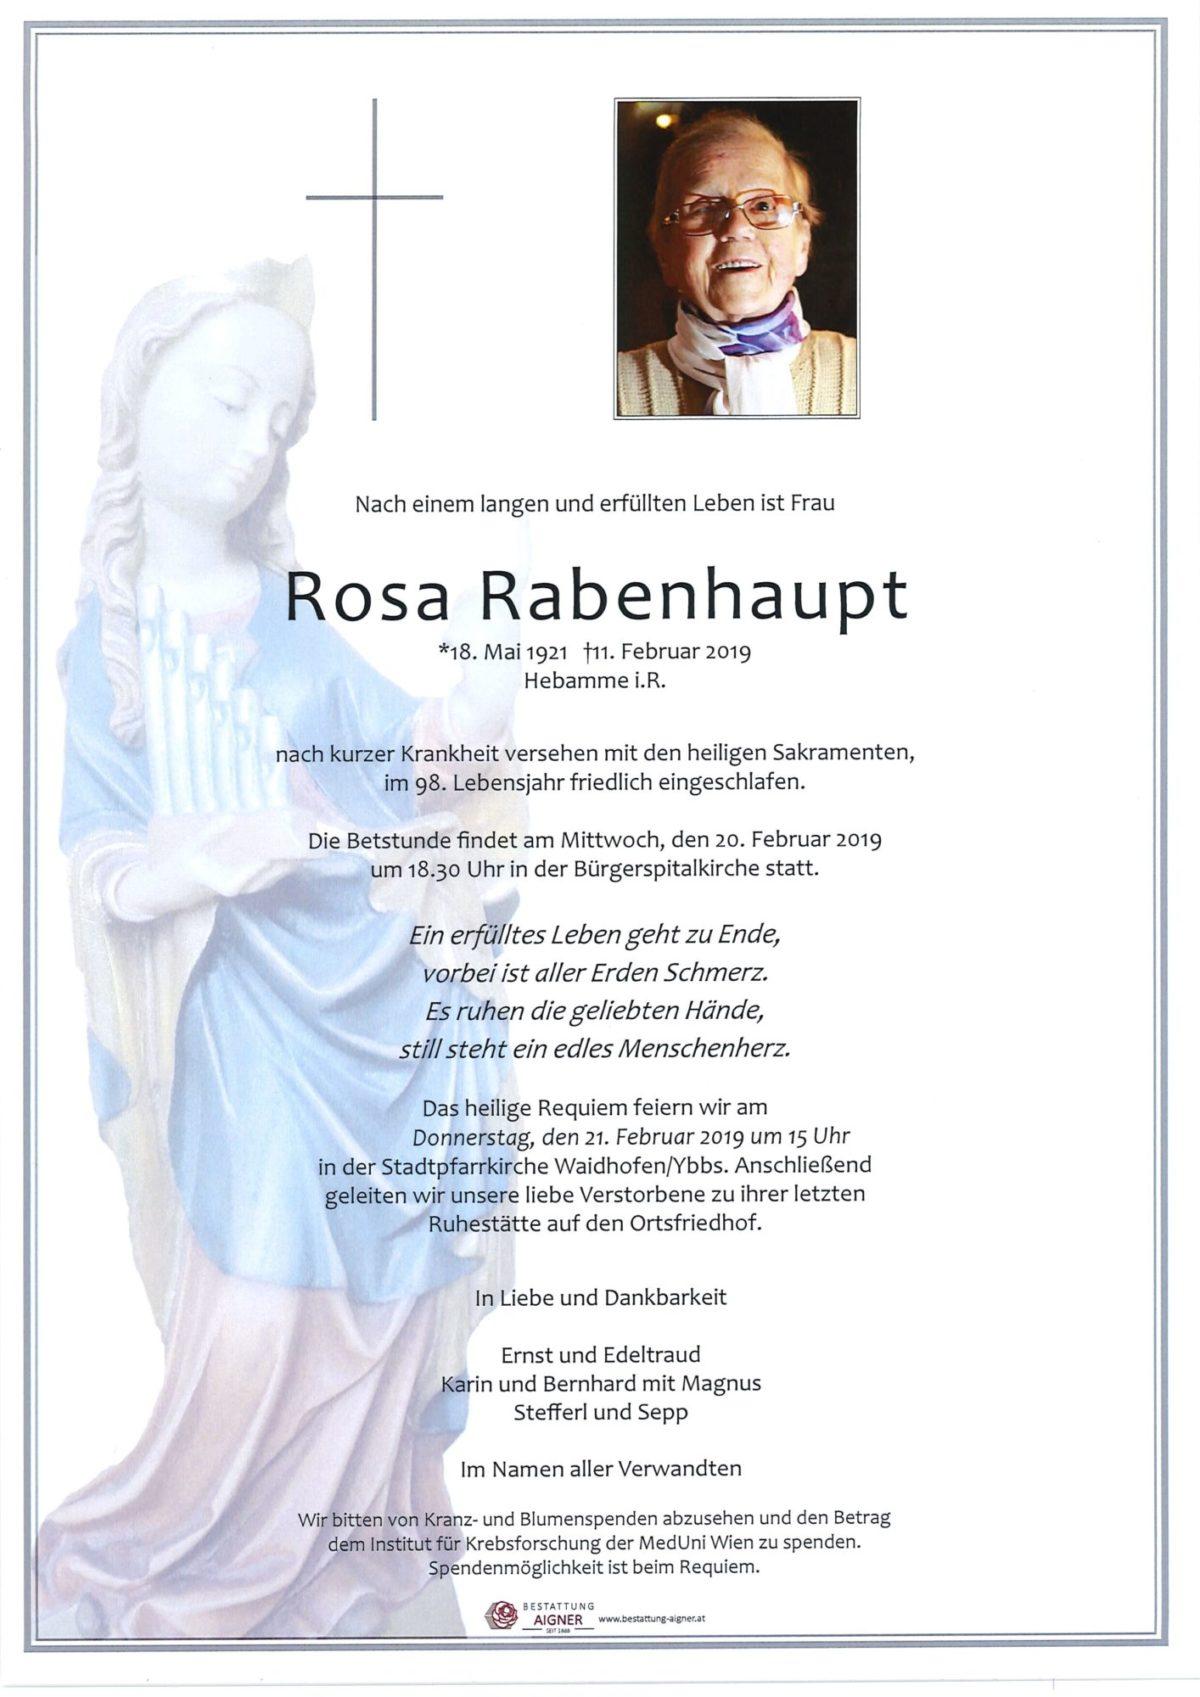 Rosa Rabenhaupt